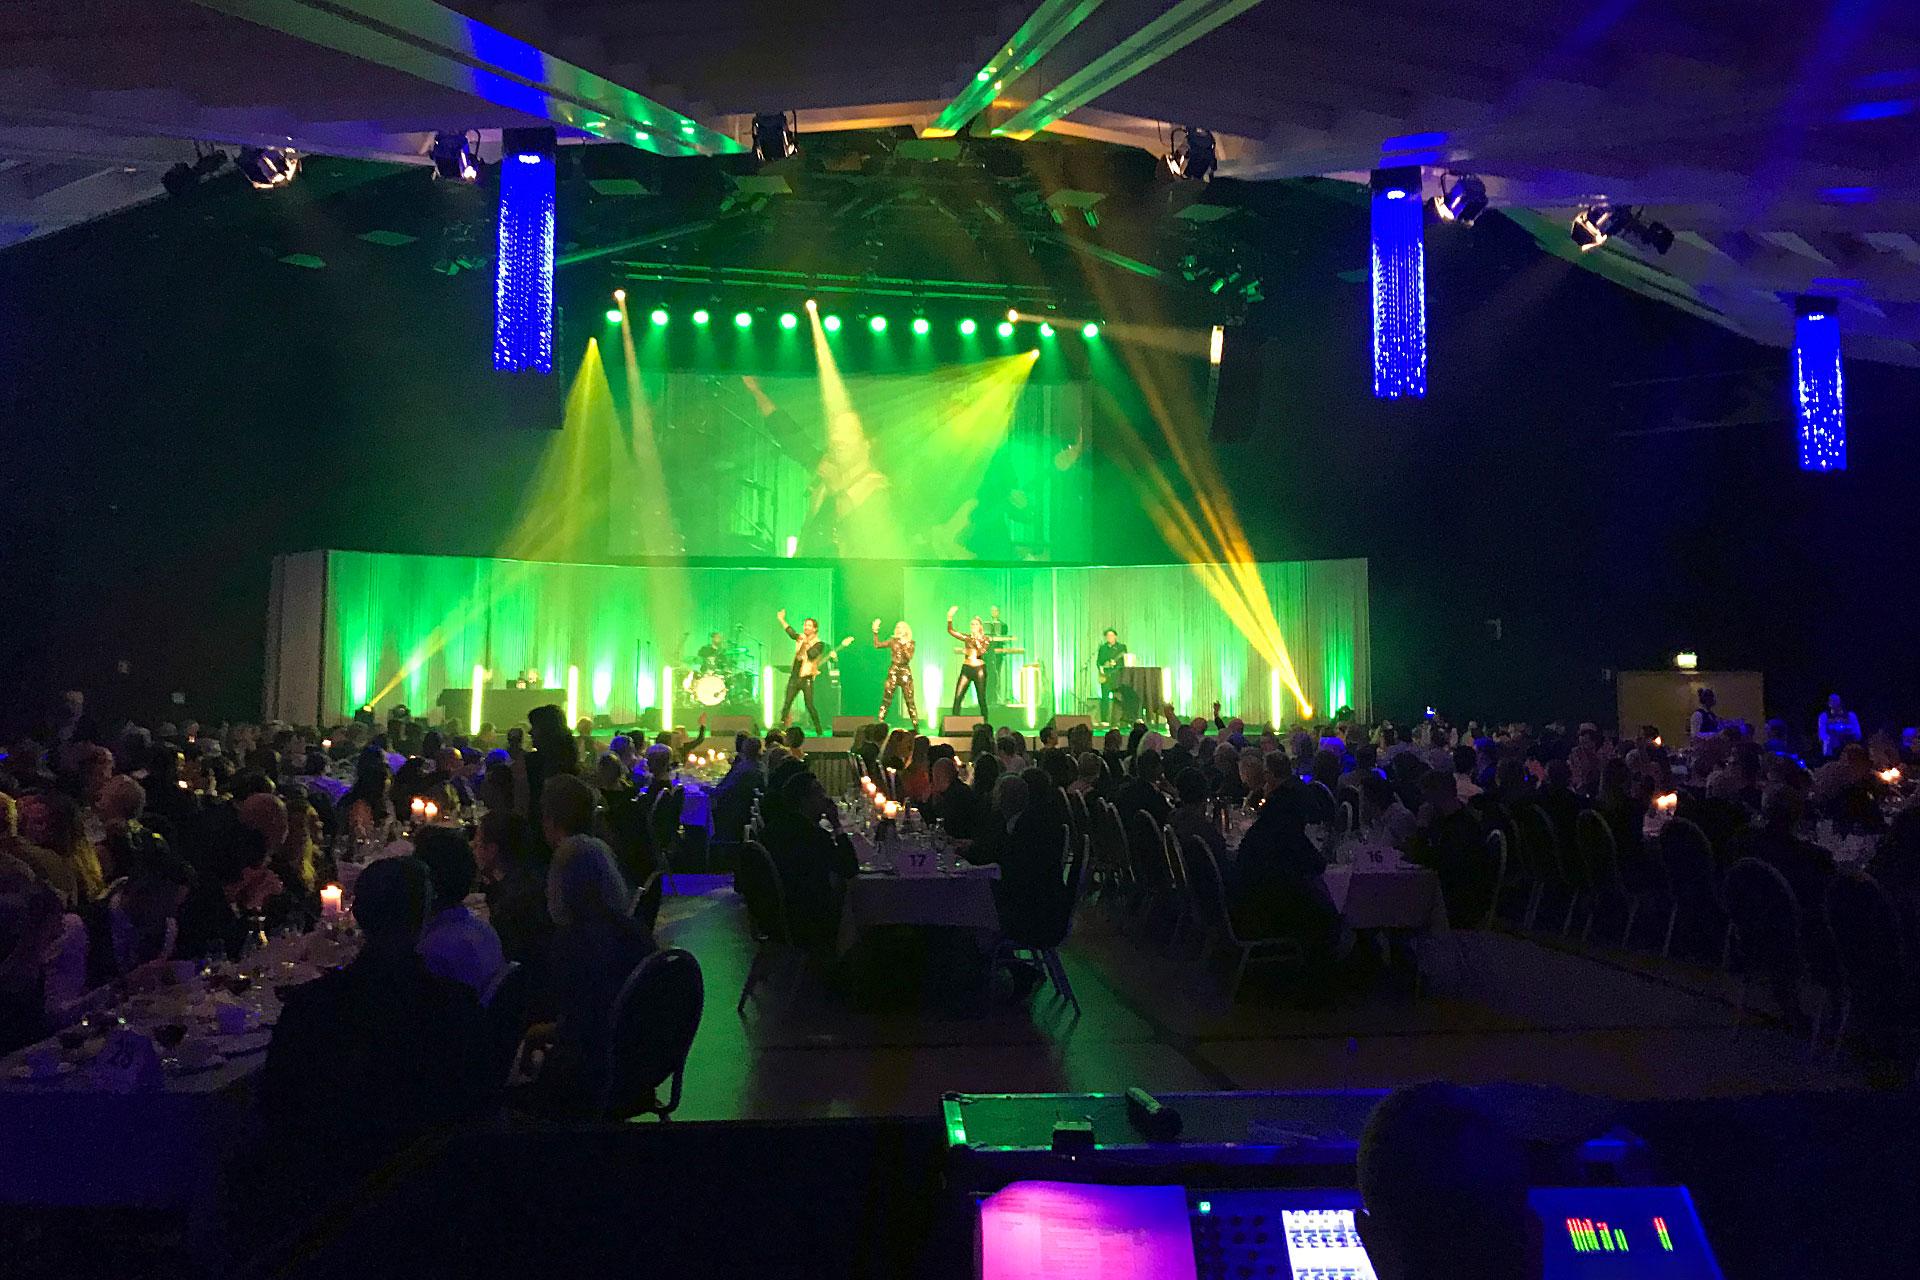 Event Group i Västerås. Fotograf: Pressbild